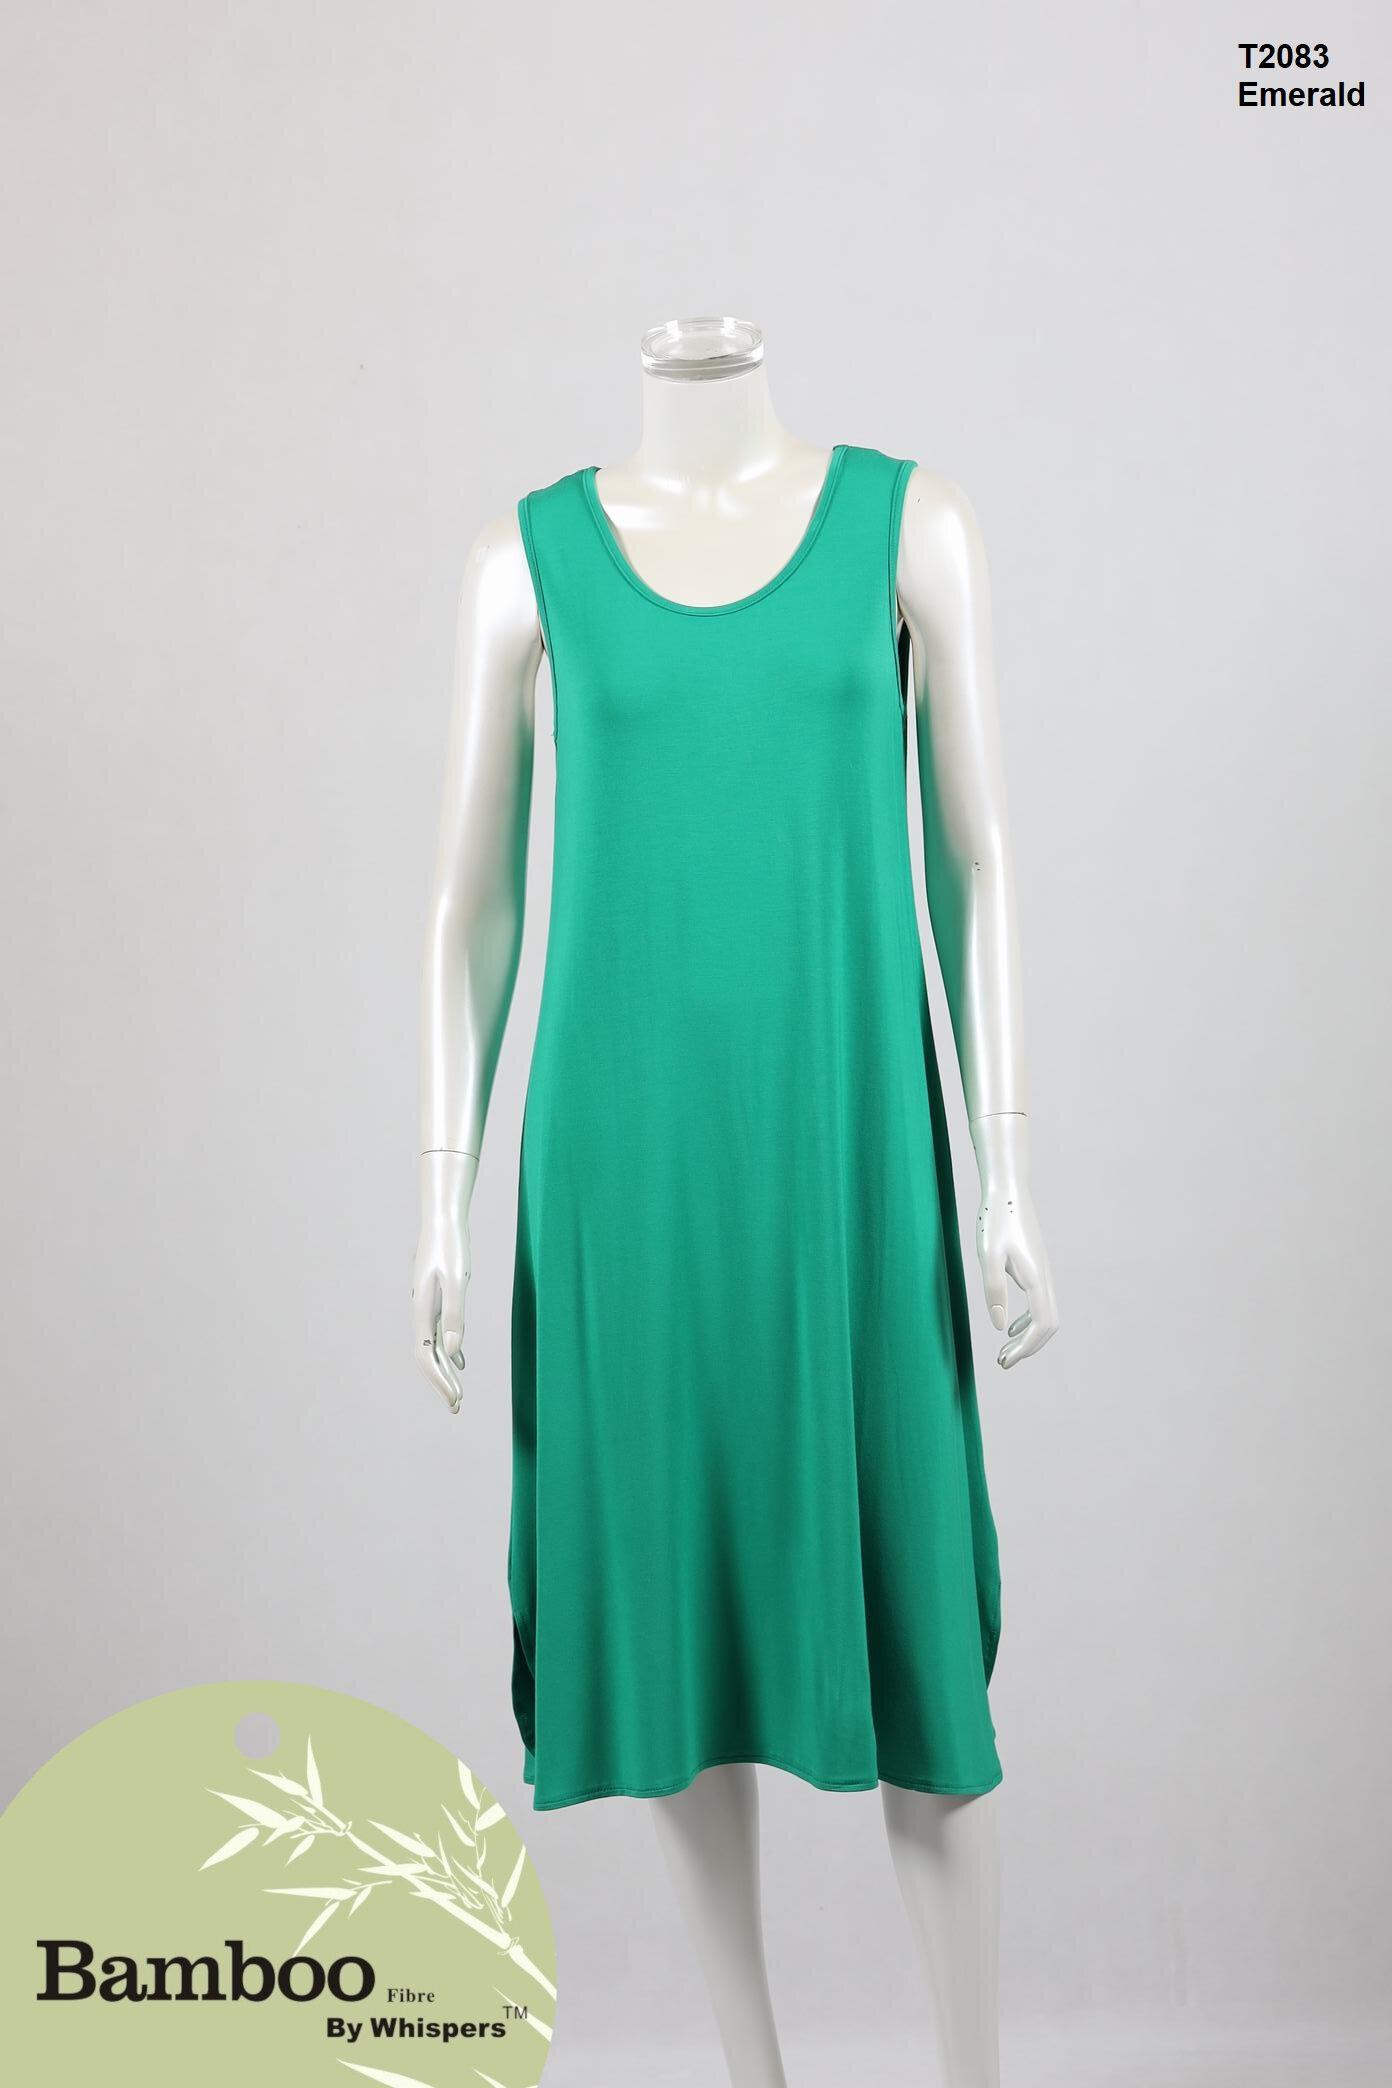 T2083-Bamboo Dress-Emerald.JPG